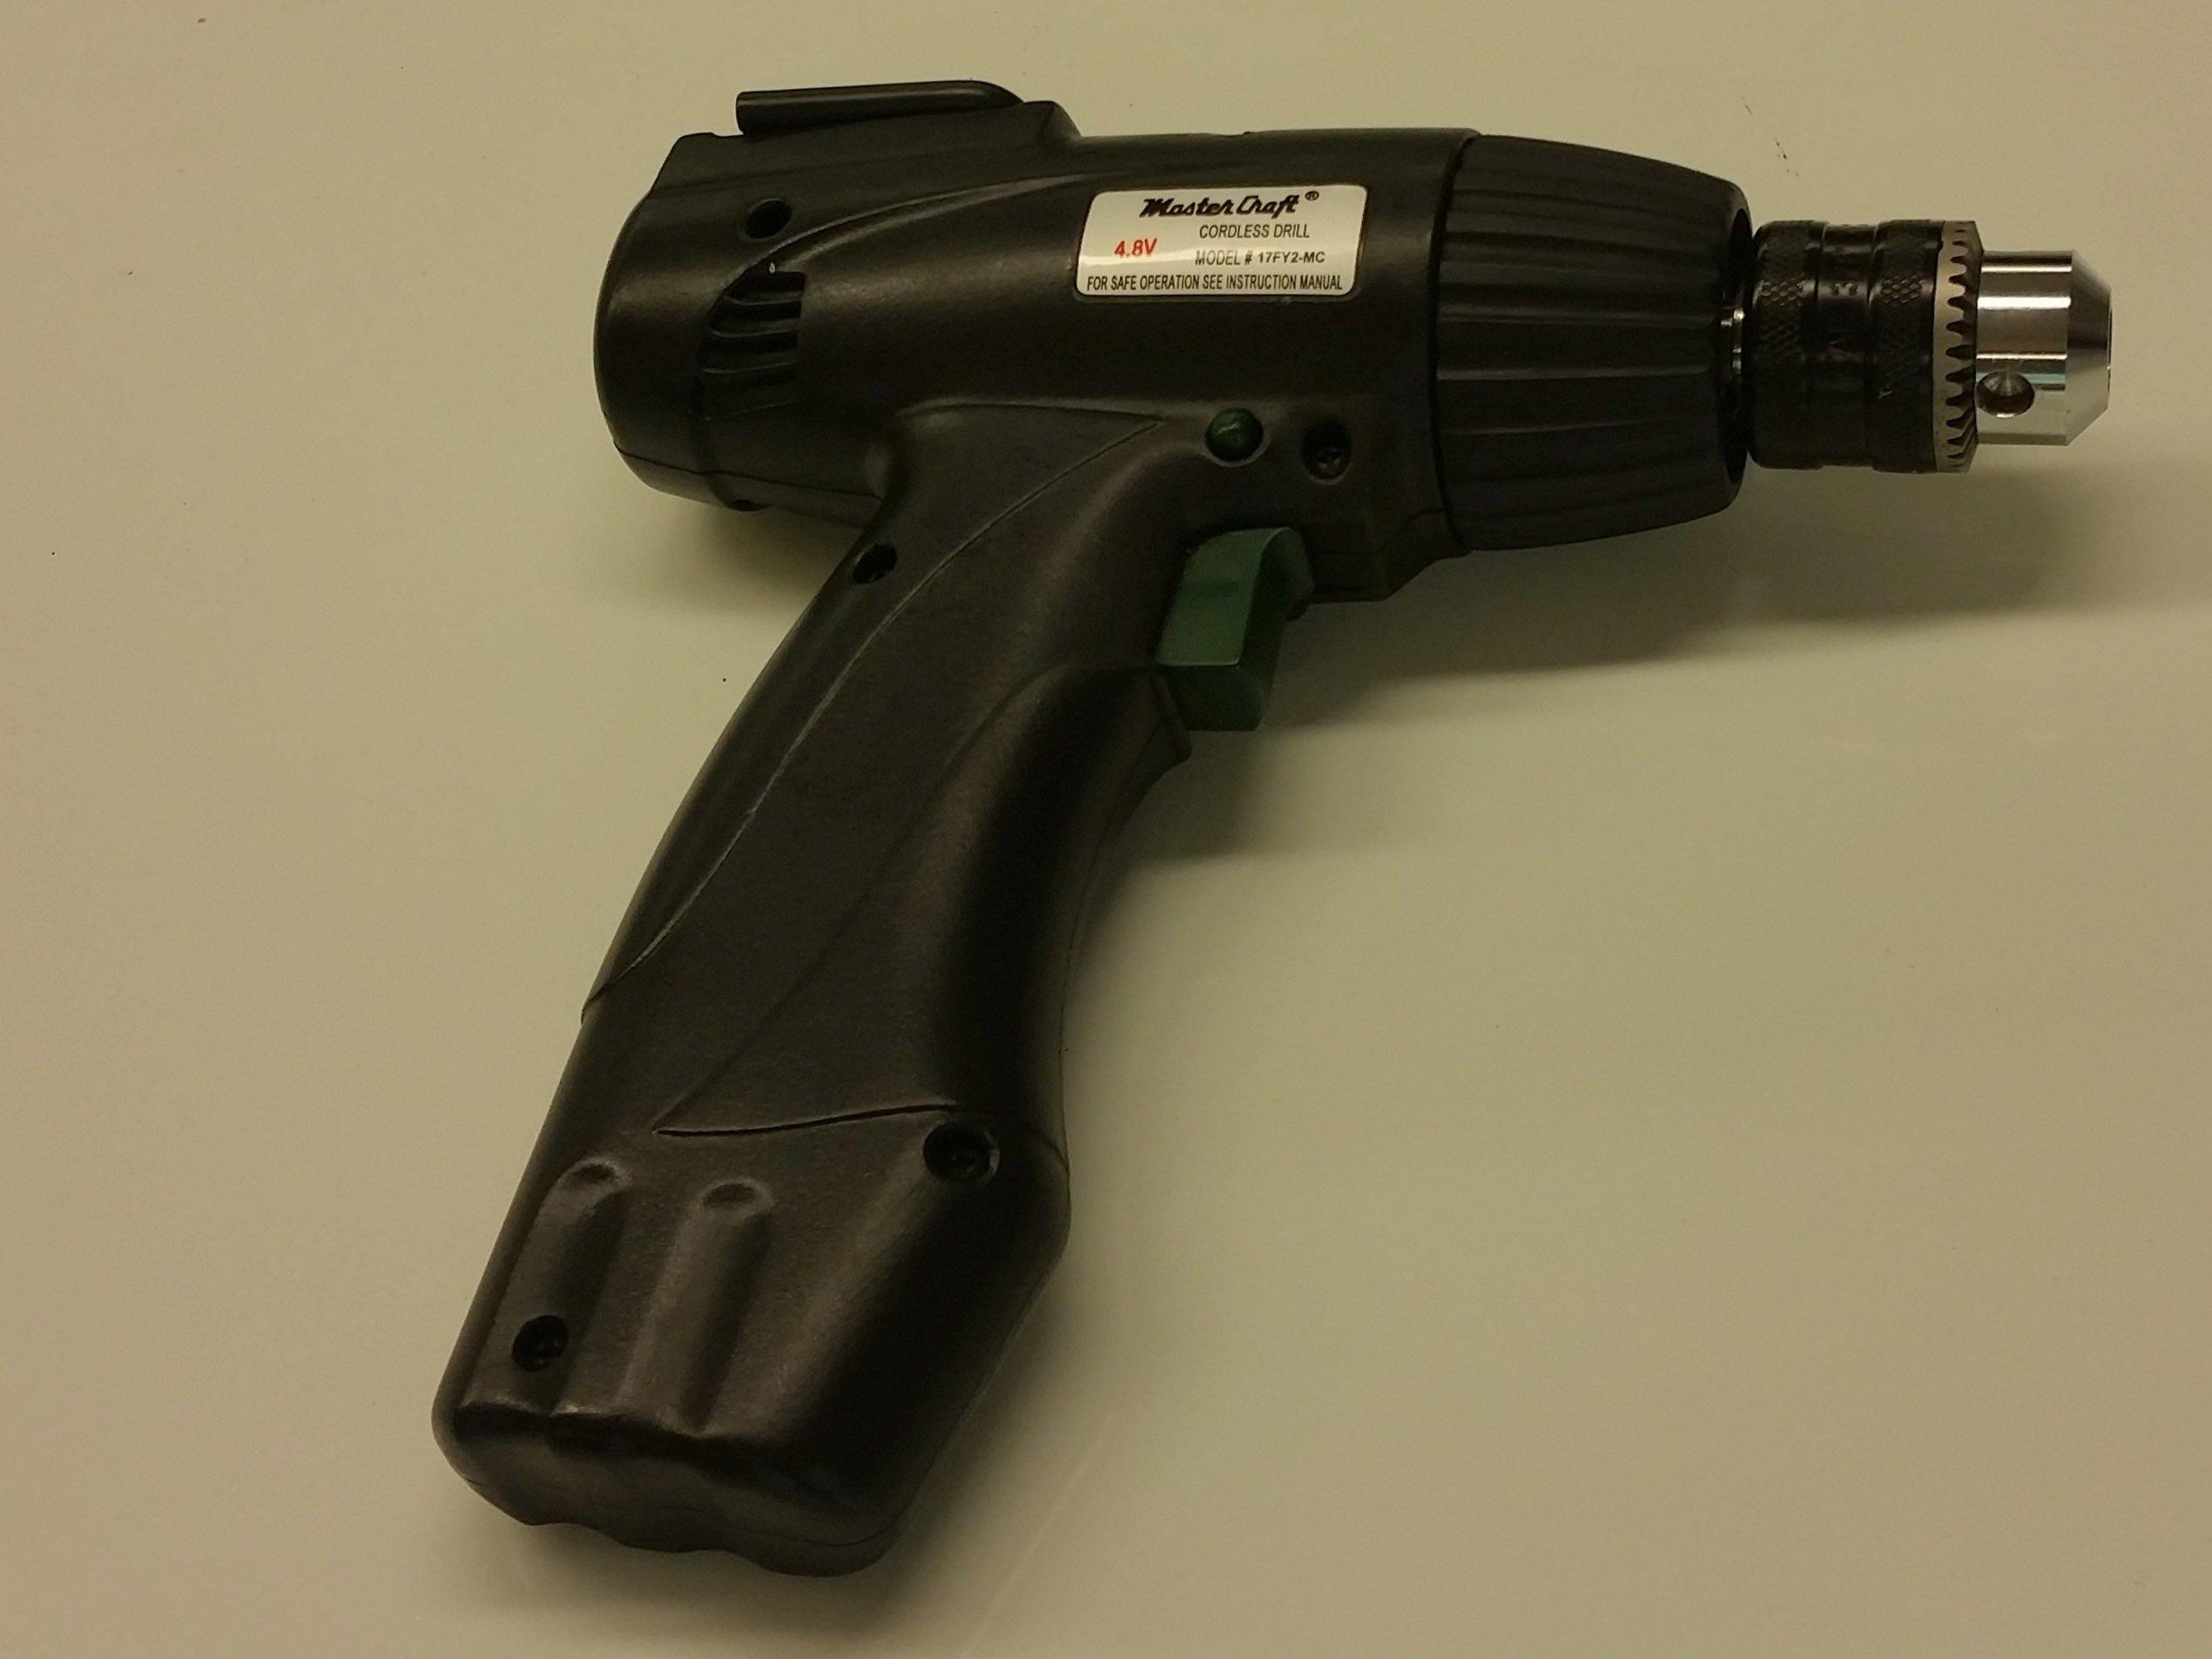 Mastercraft 17fy2 Mc Cordless Drill